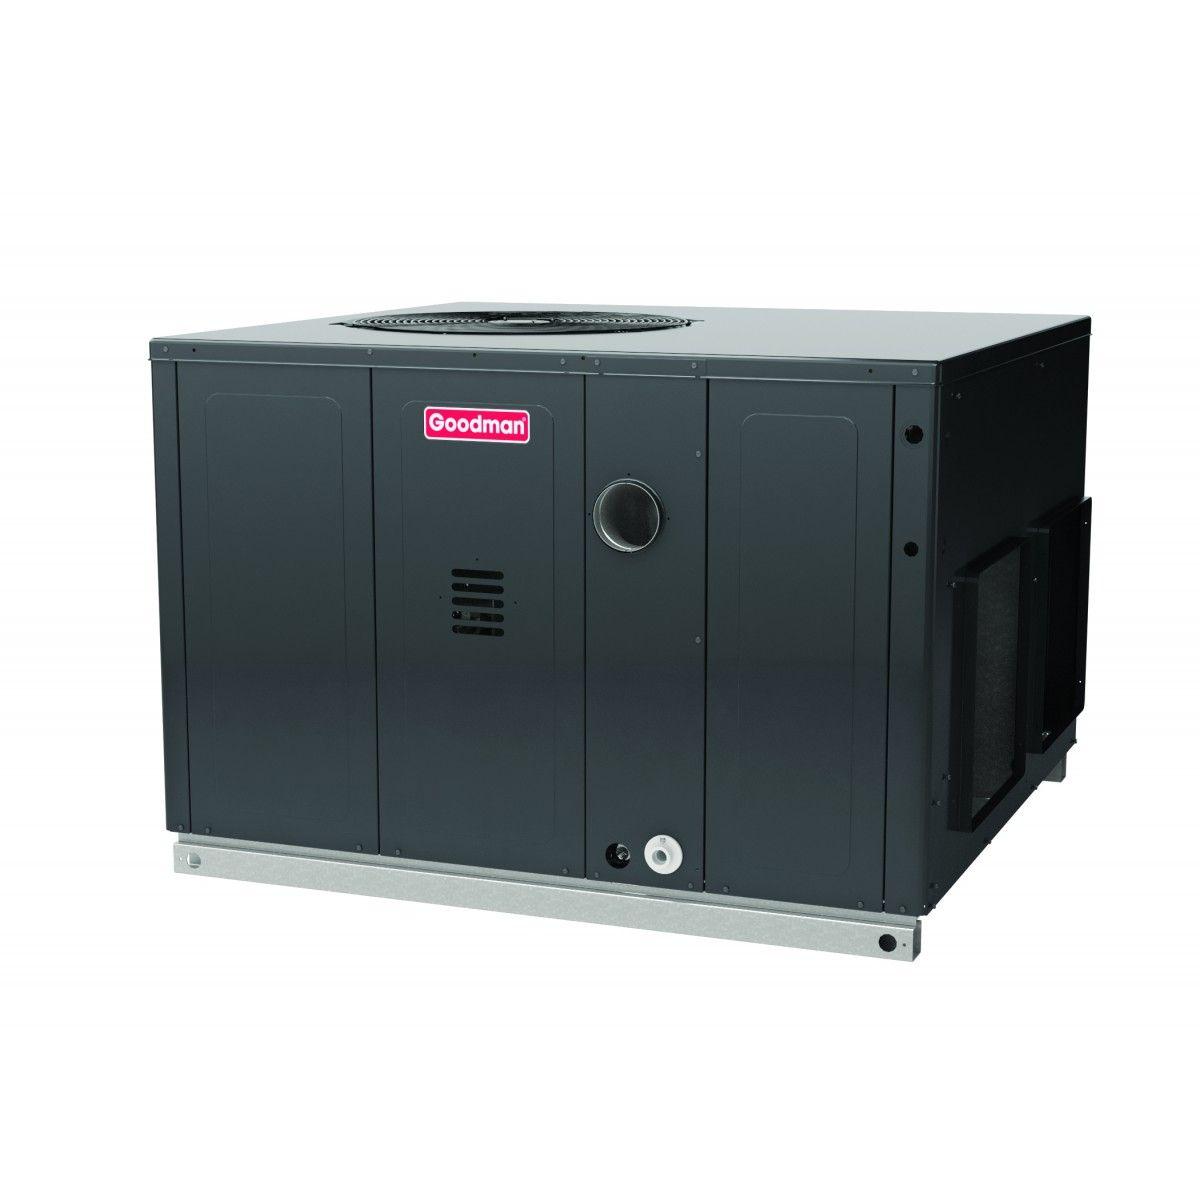 Goodman 3 0 Ton 14 Seer 60k Btu Packge Unit With Gas Heat